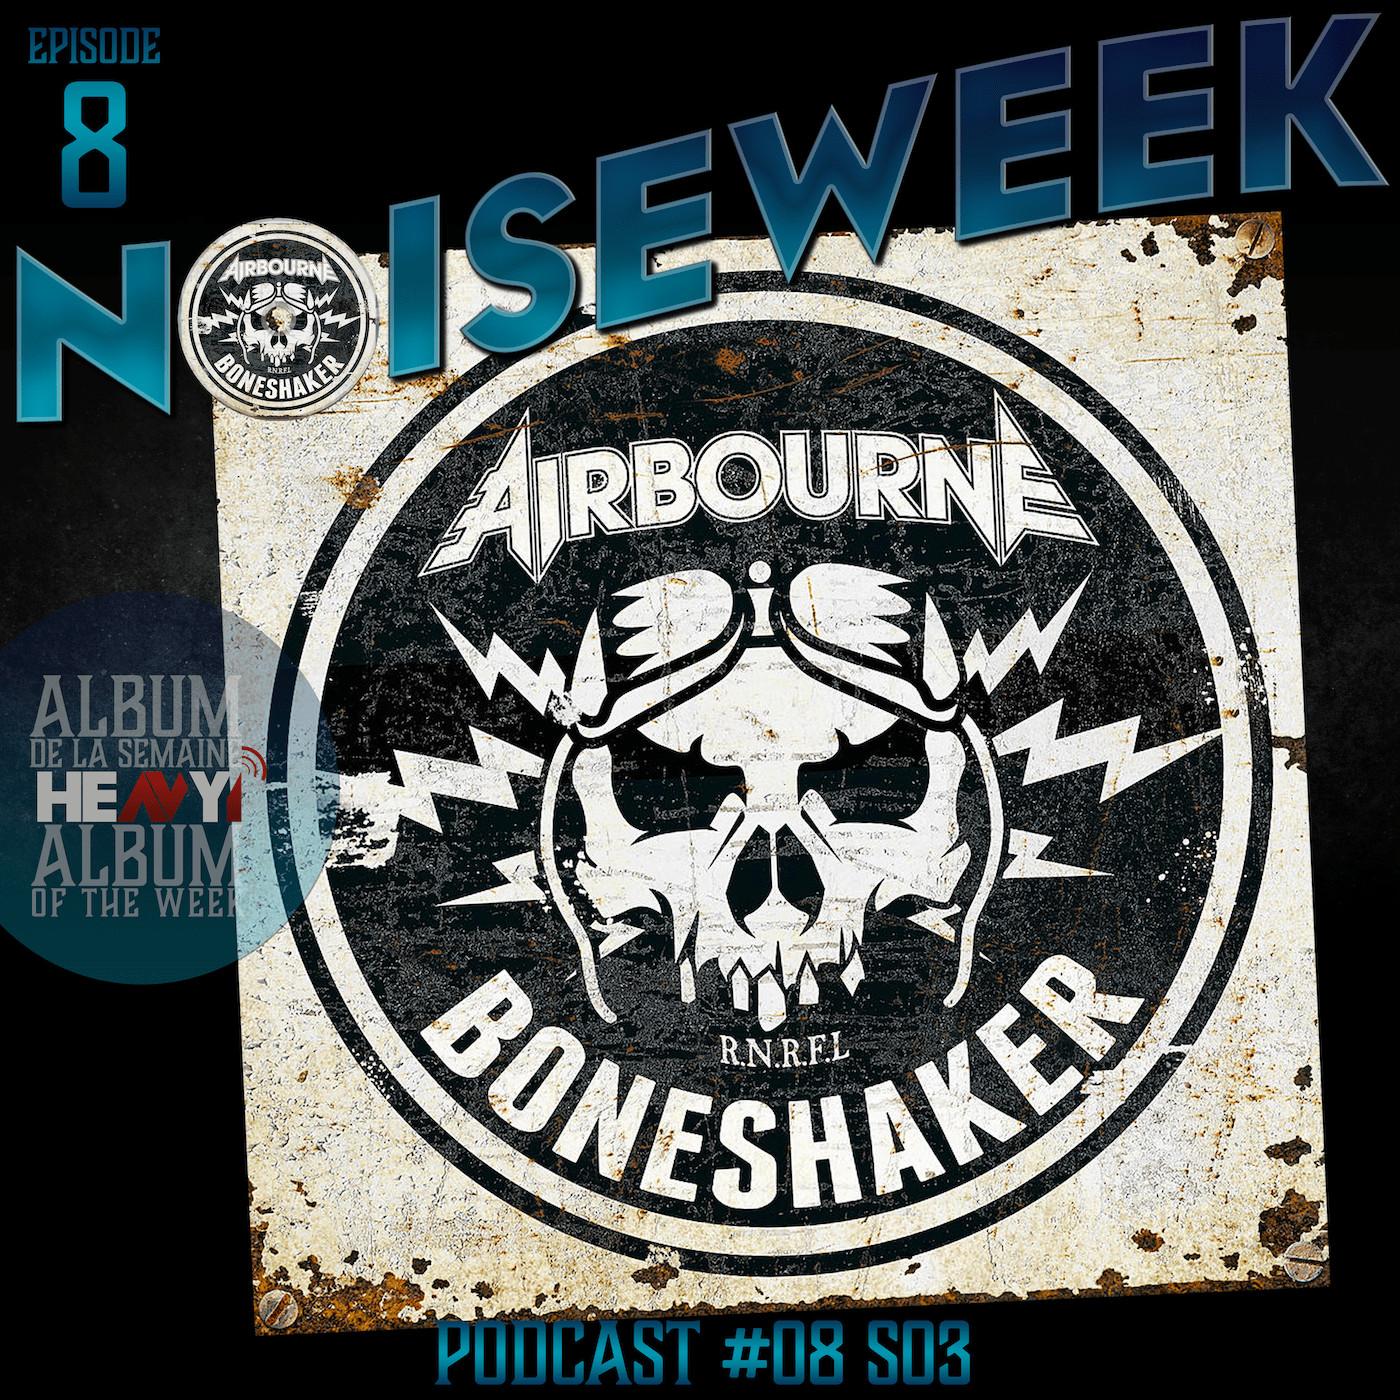 Noiseweek #08 Saison 3